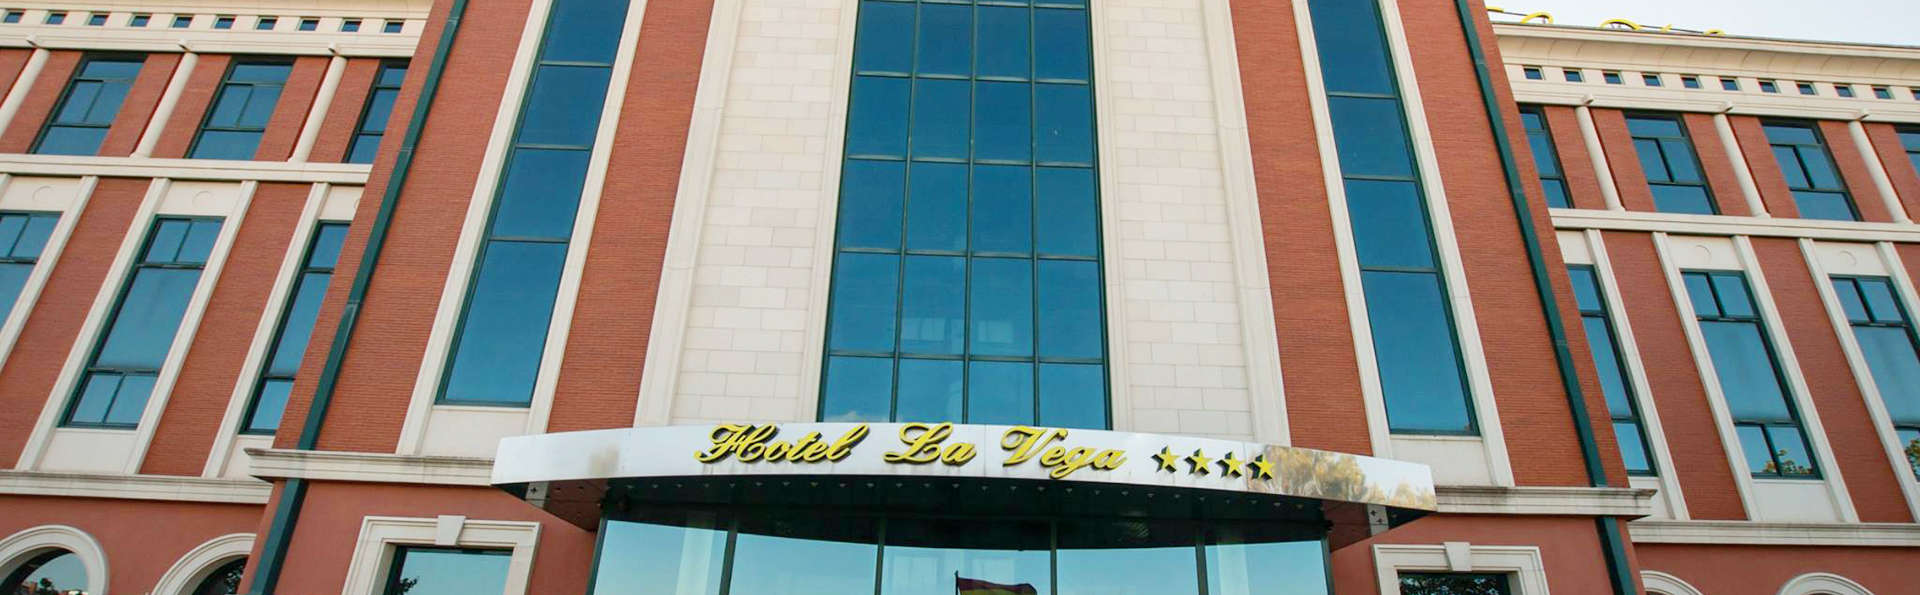 Hotel La Vega - edit_facade1.jpg